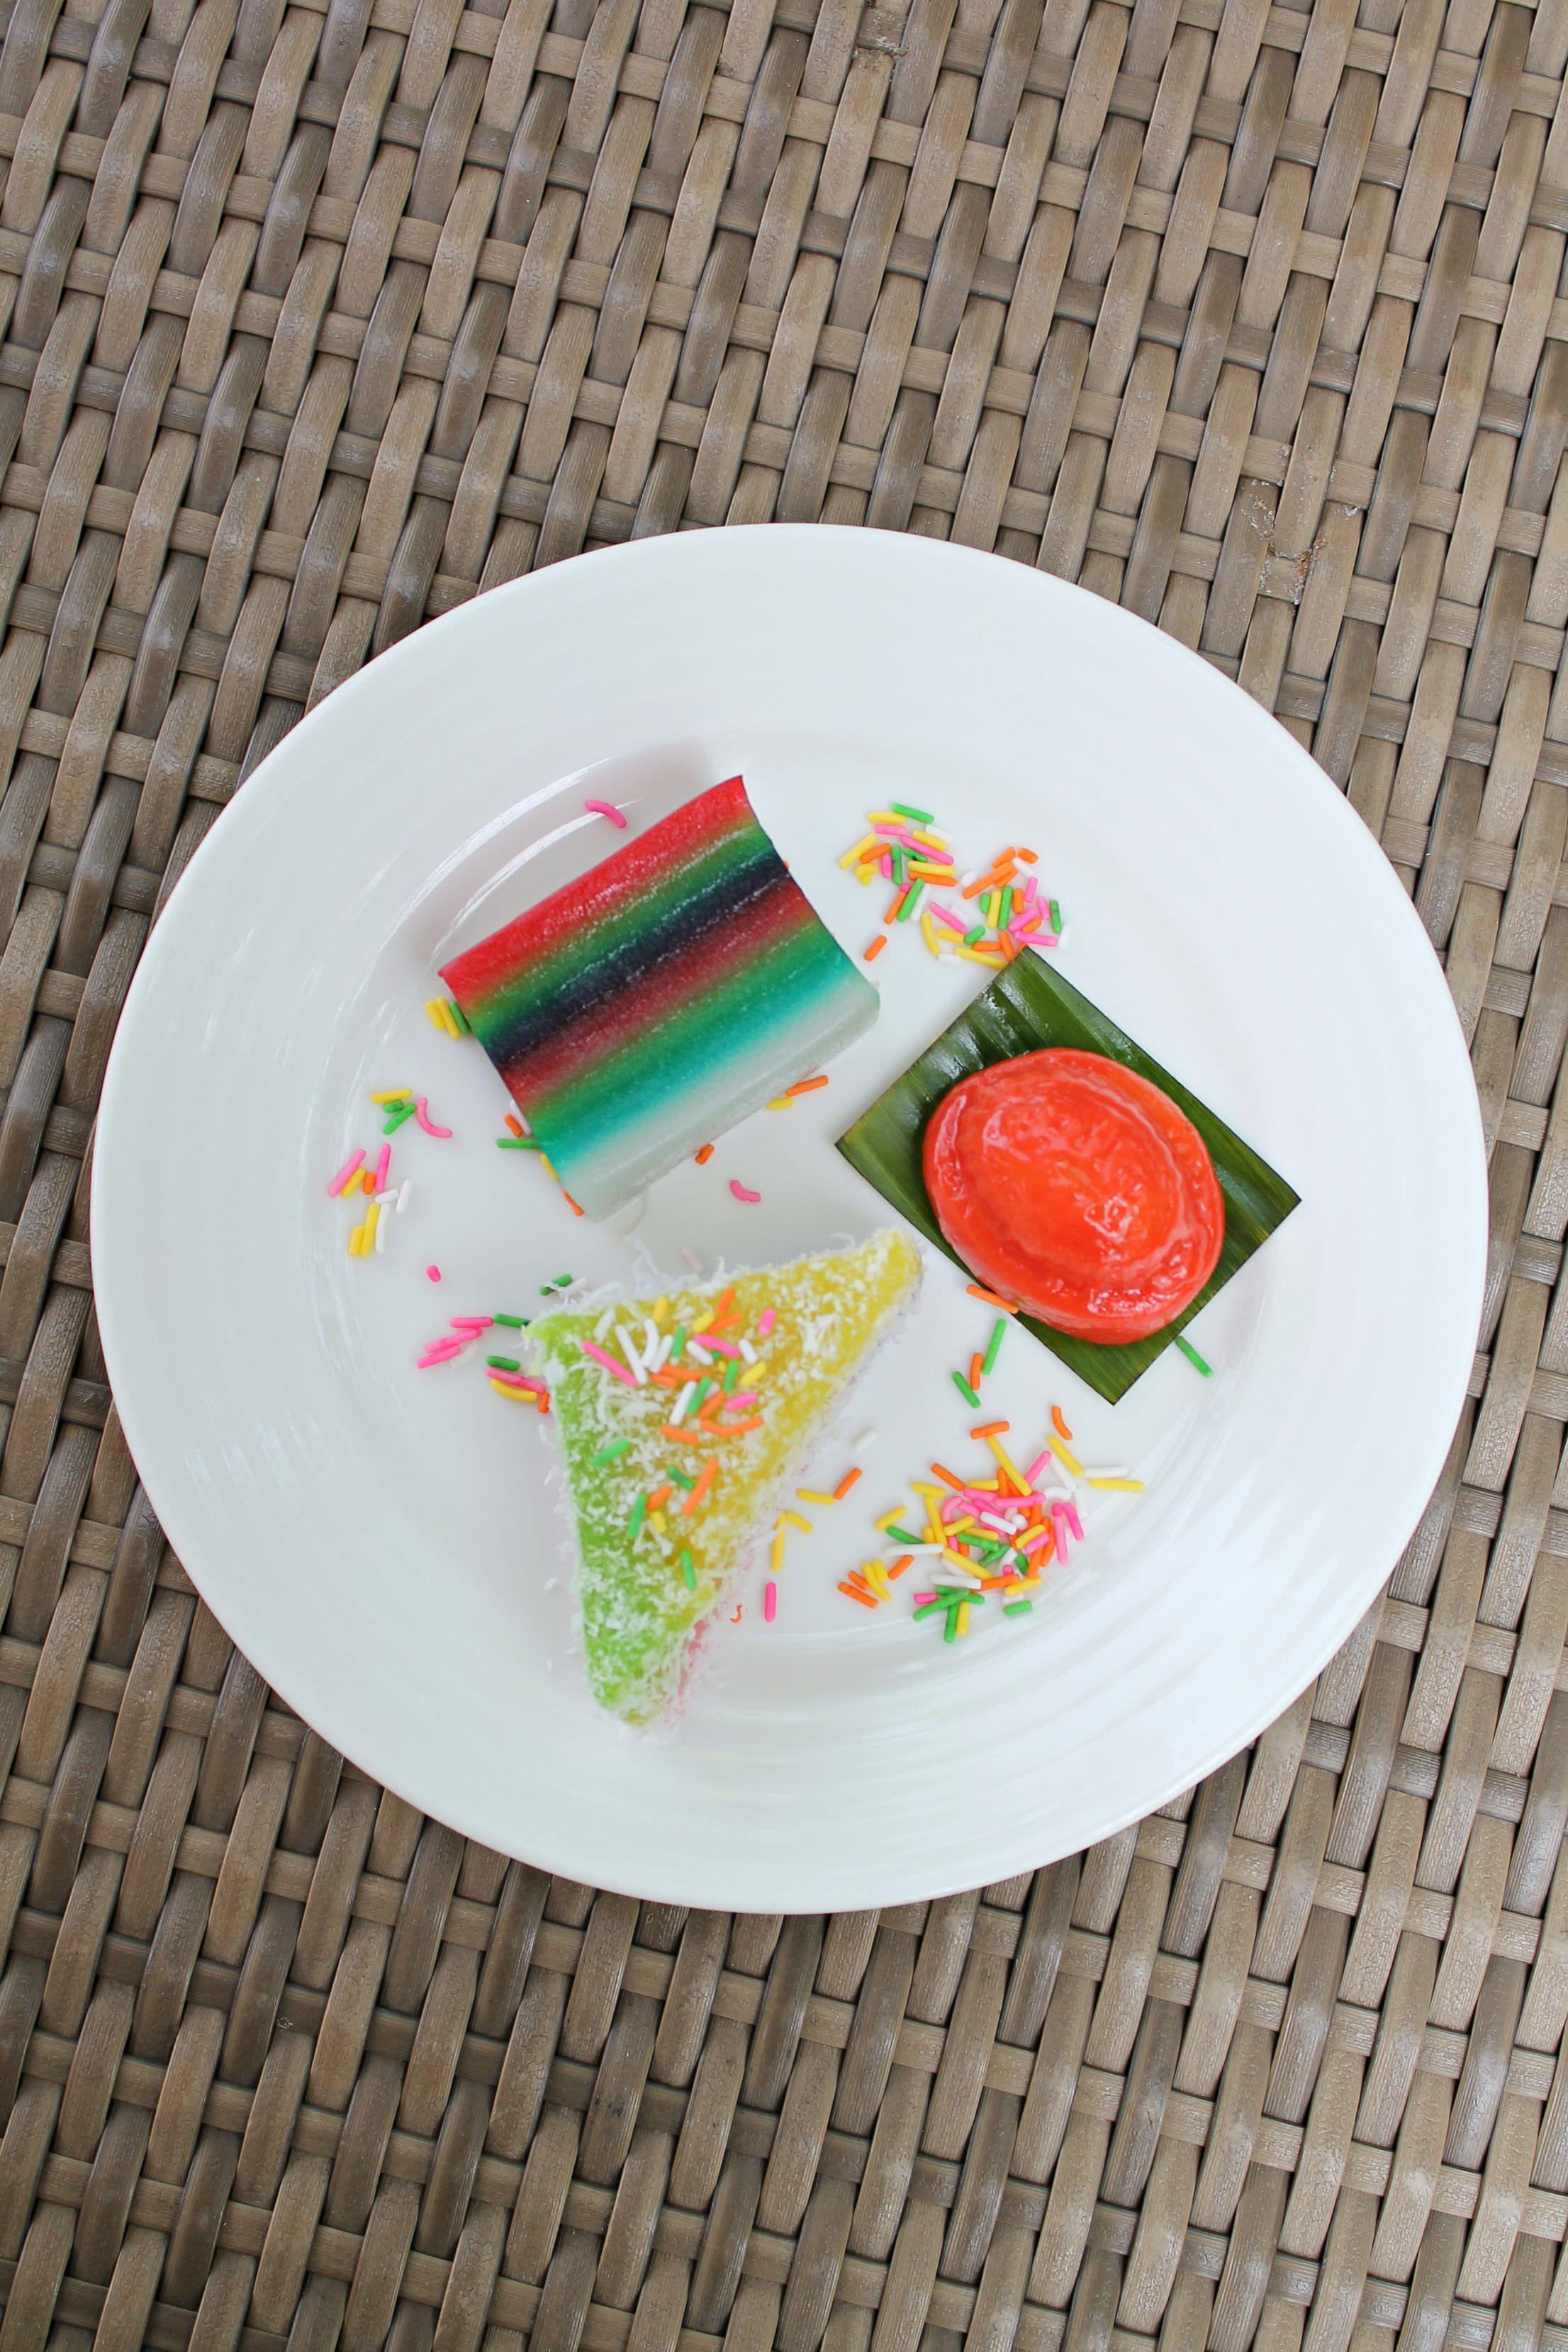 Colourful-kuih-Shangri-La-Rasa-Sentosa-resort-photo-by-Little-Big-Bell